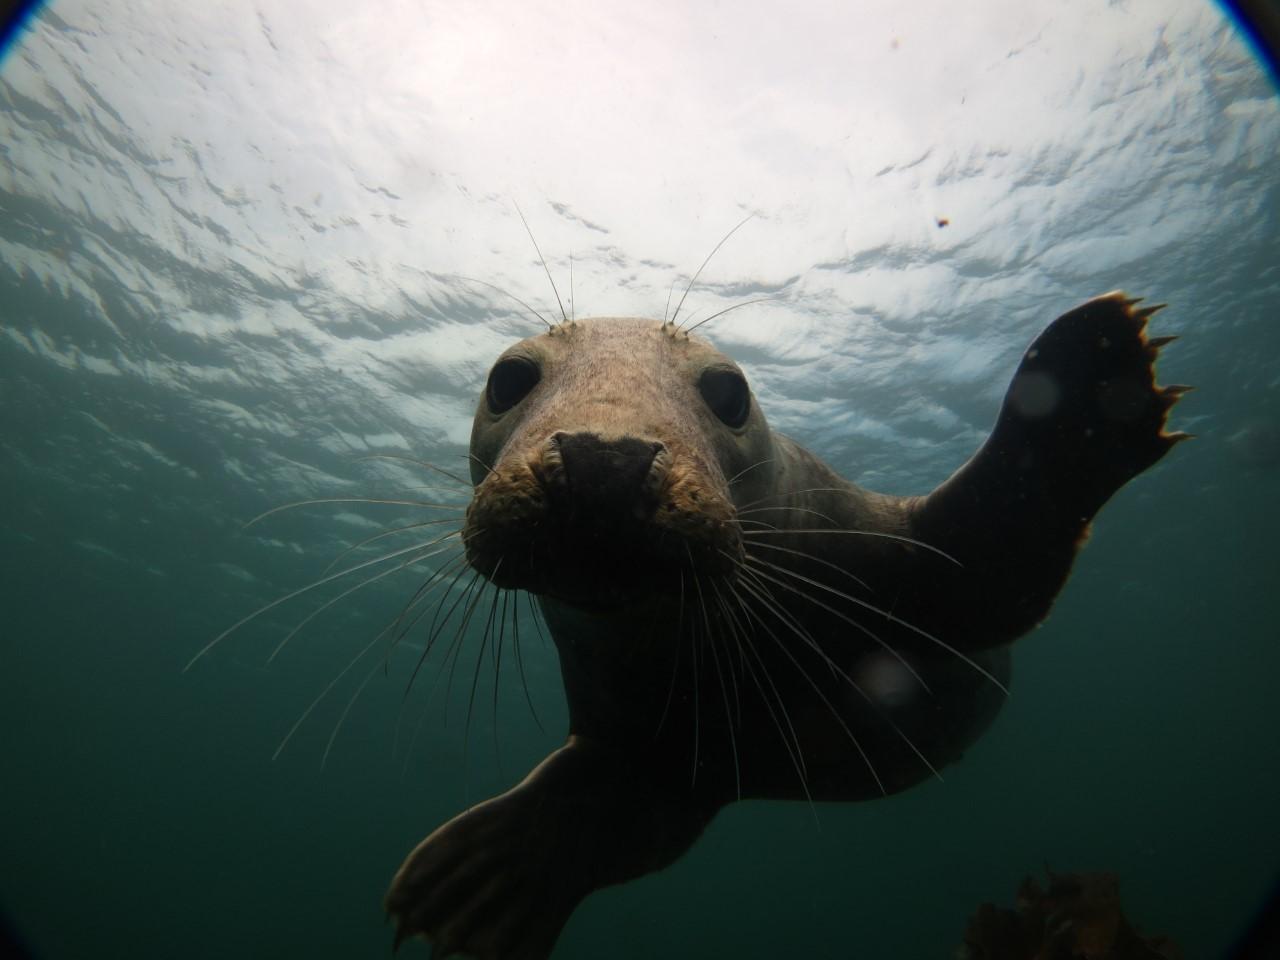 1. Seal